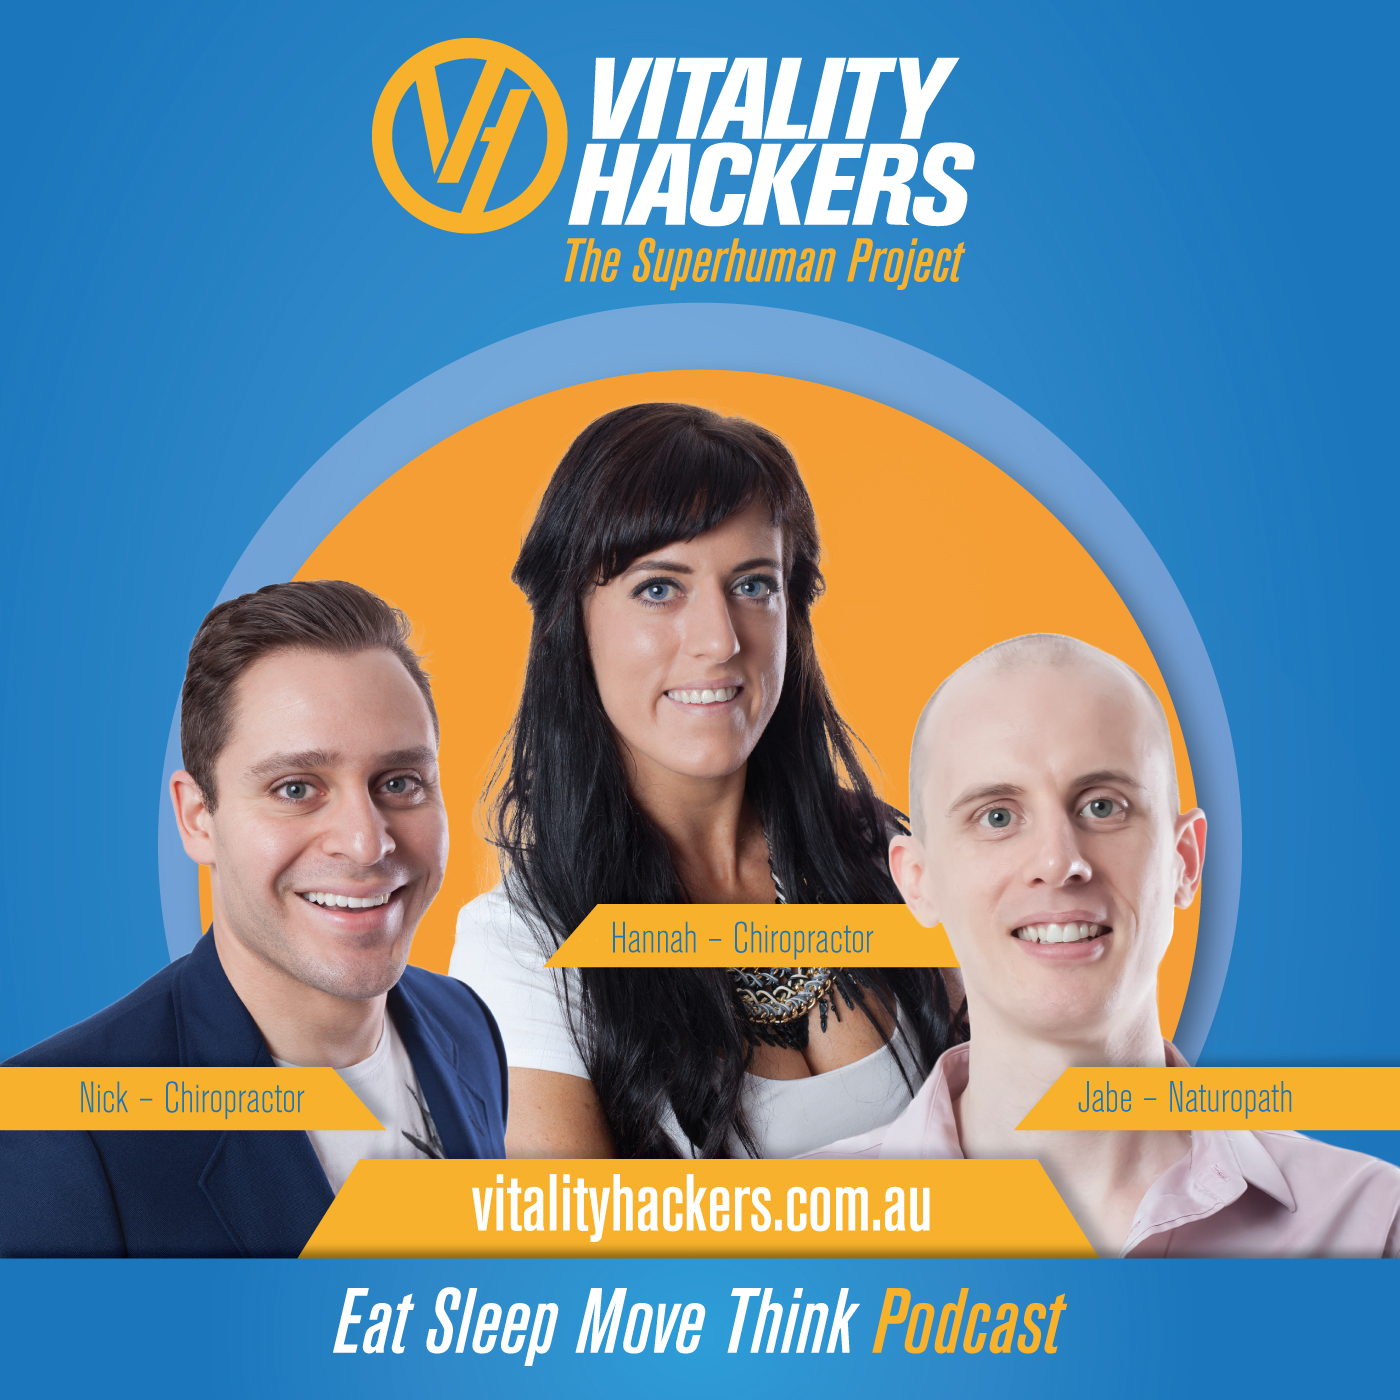 Vitality Hackers